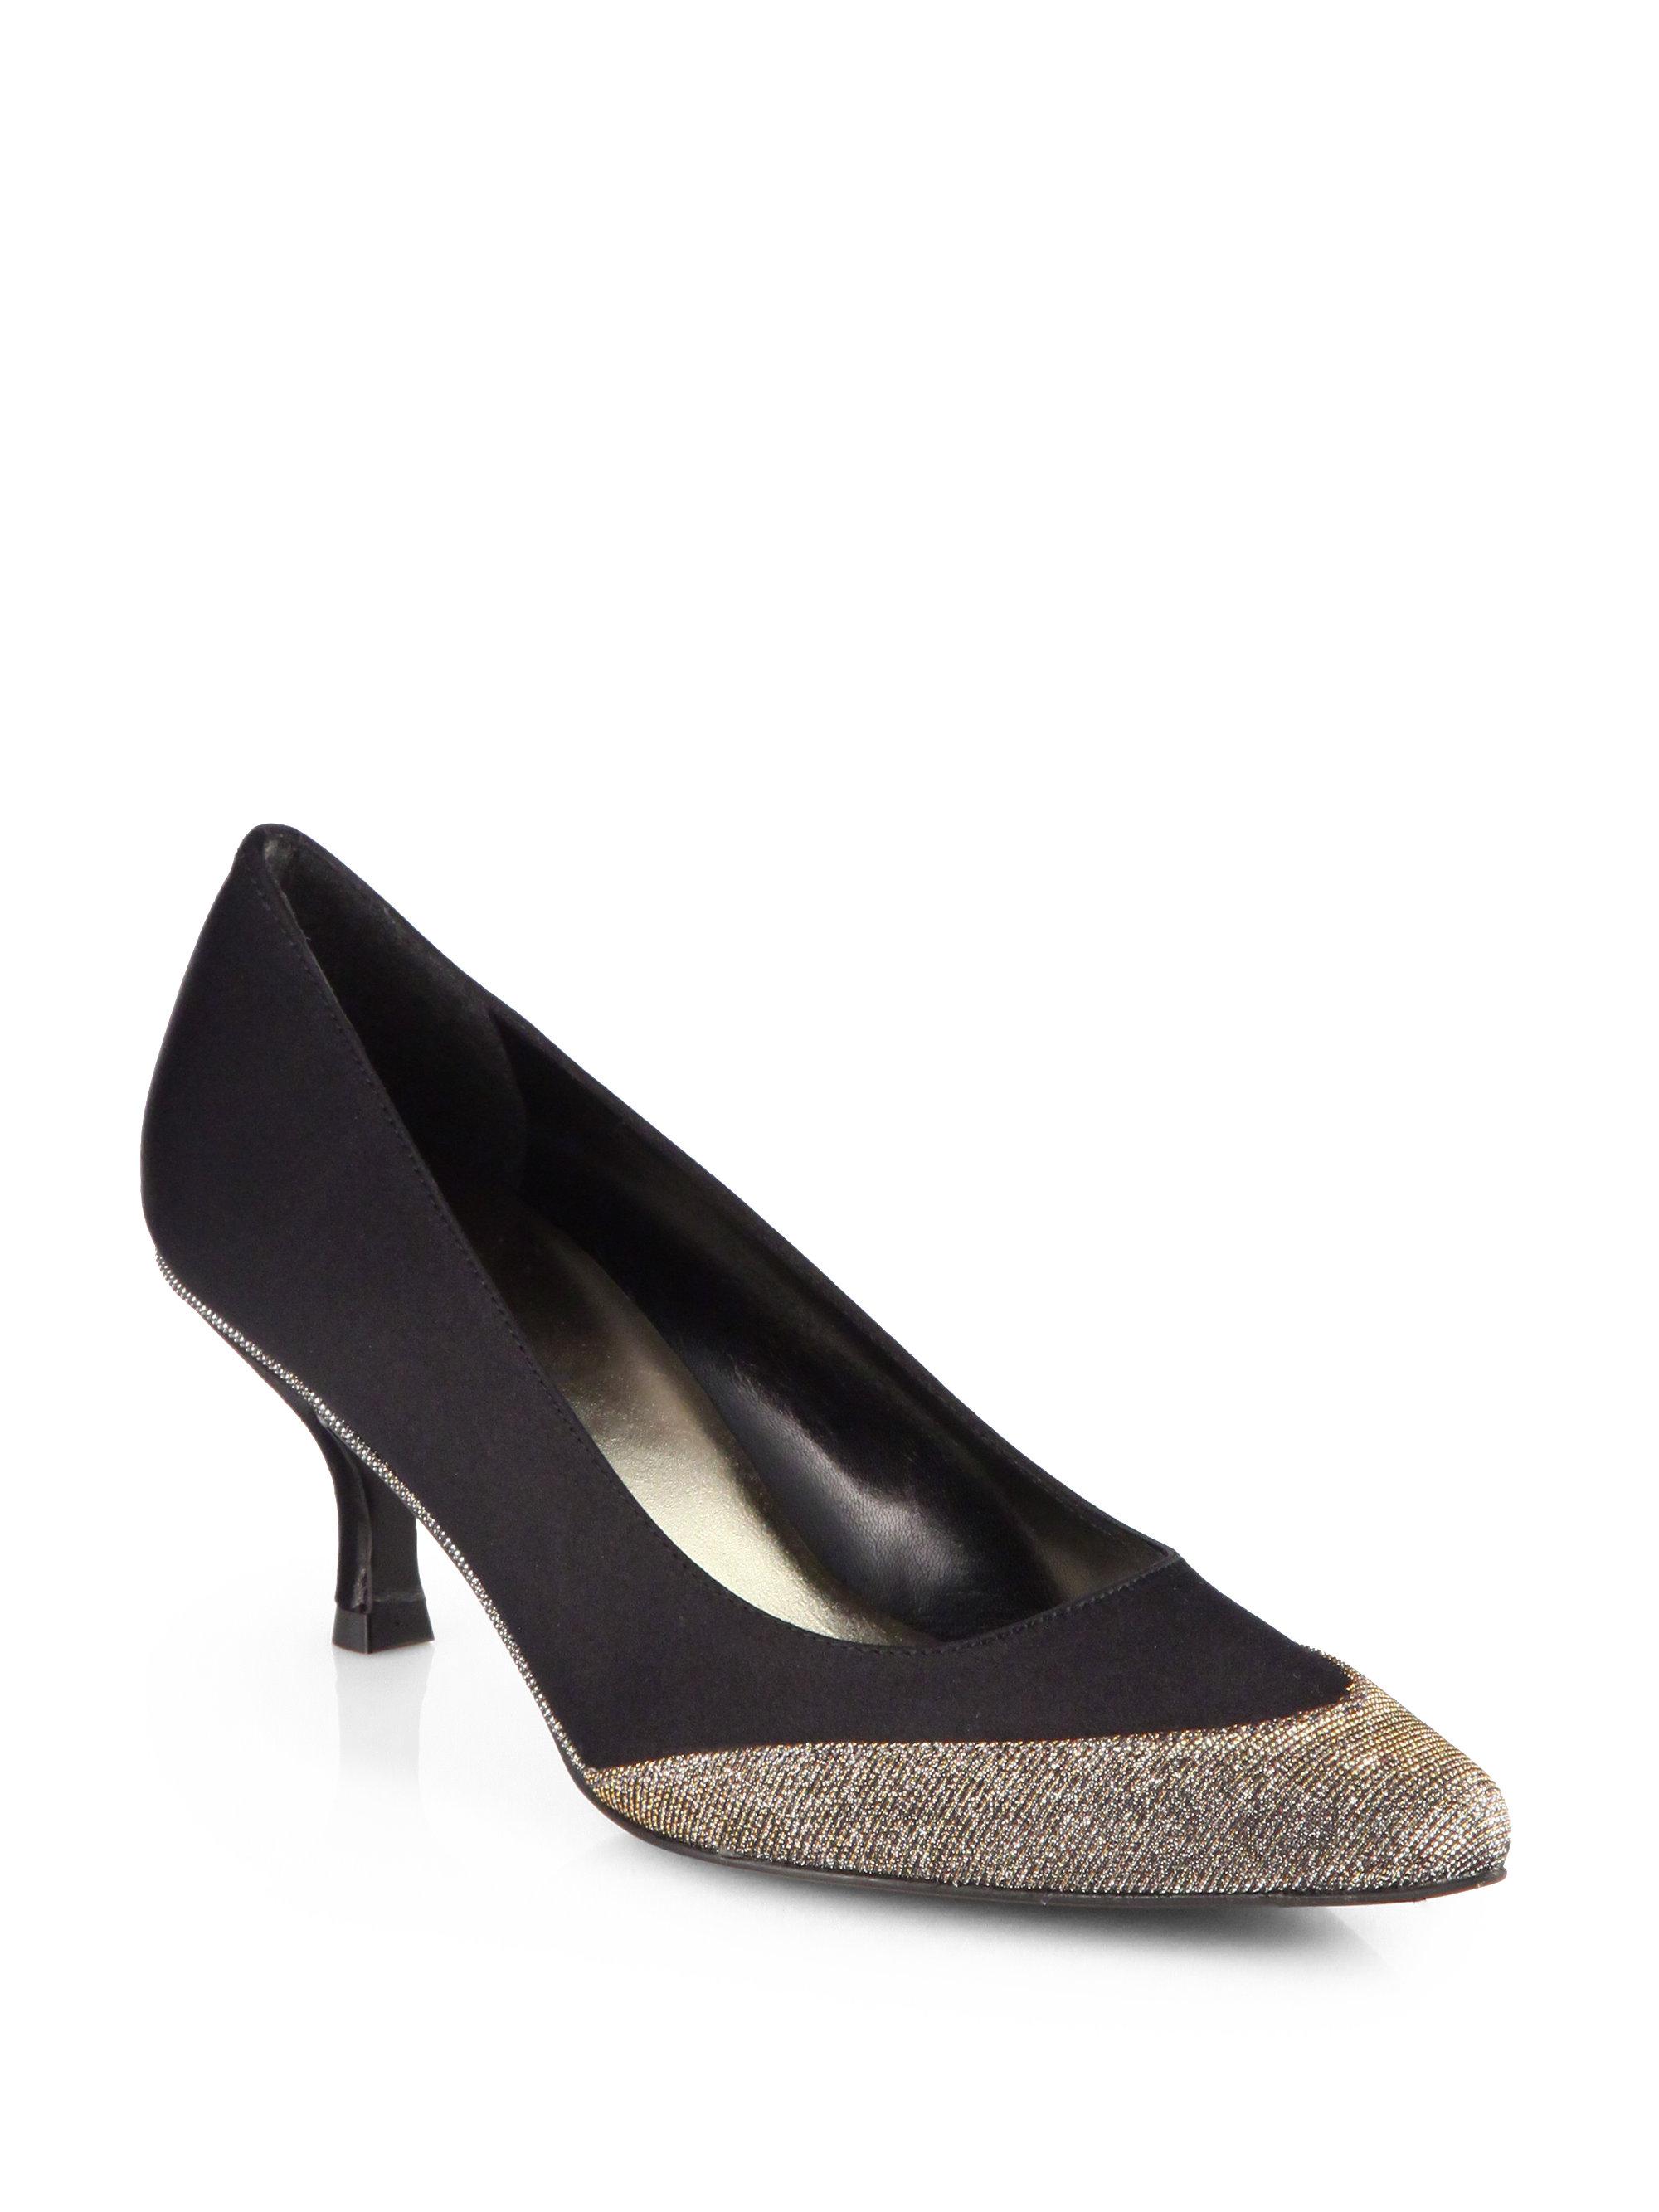 Black Glitter Pump Shoes